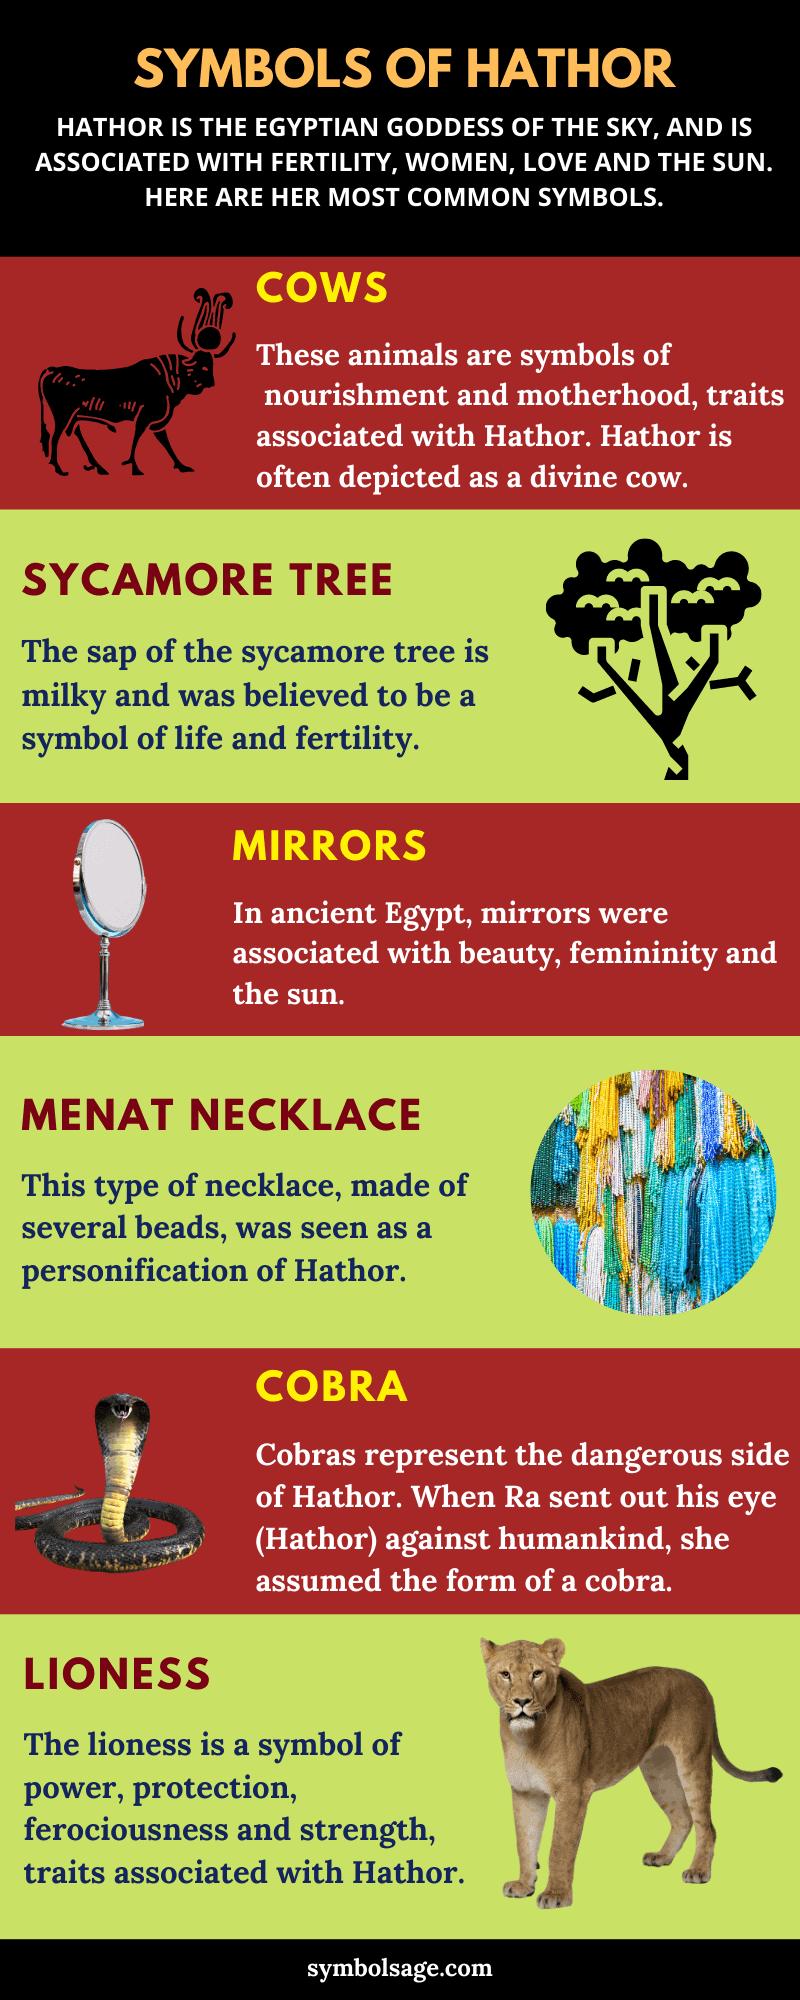 Symbols of Hathor goddess of sky